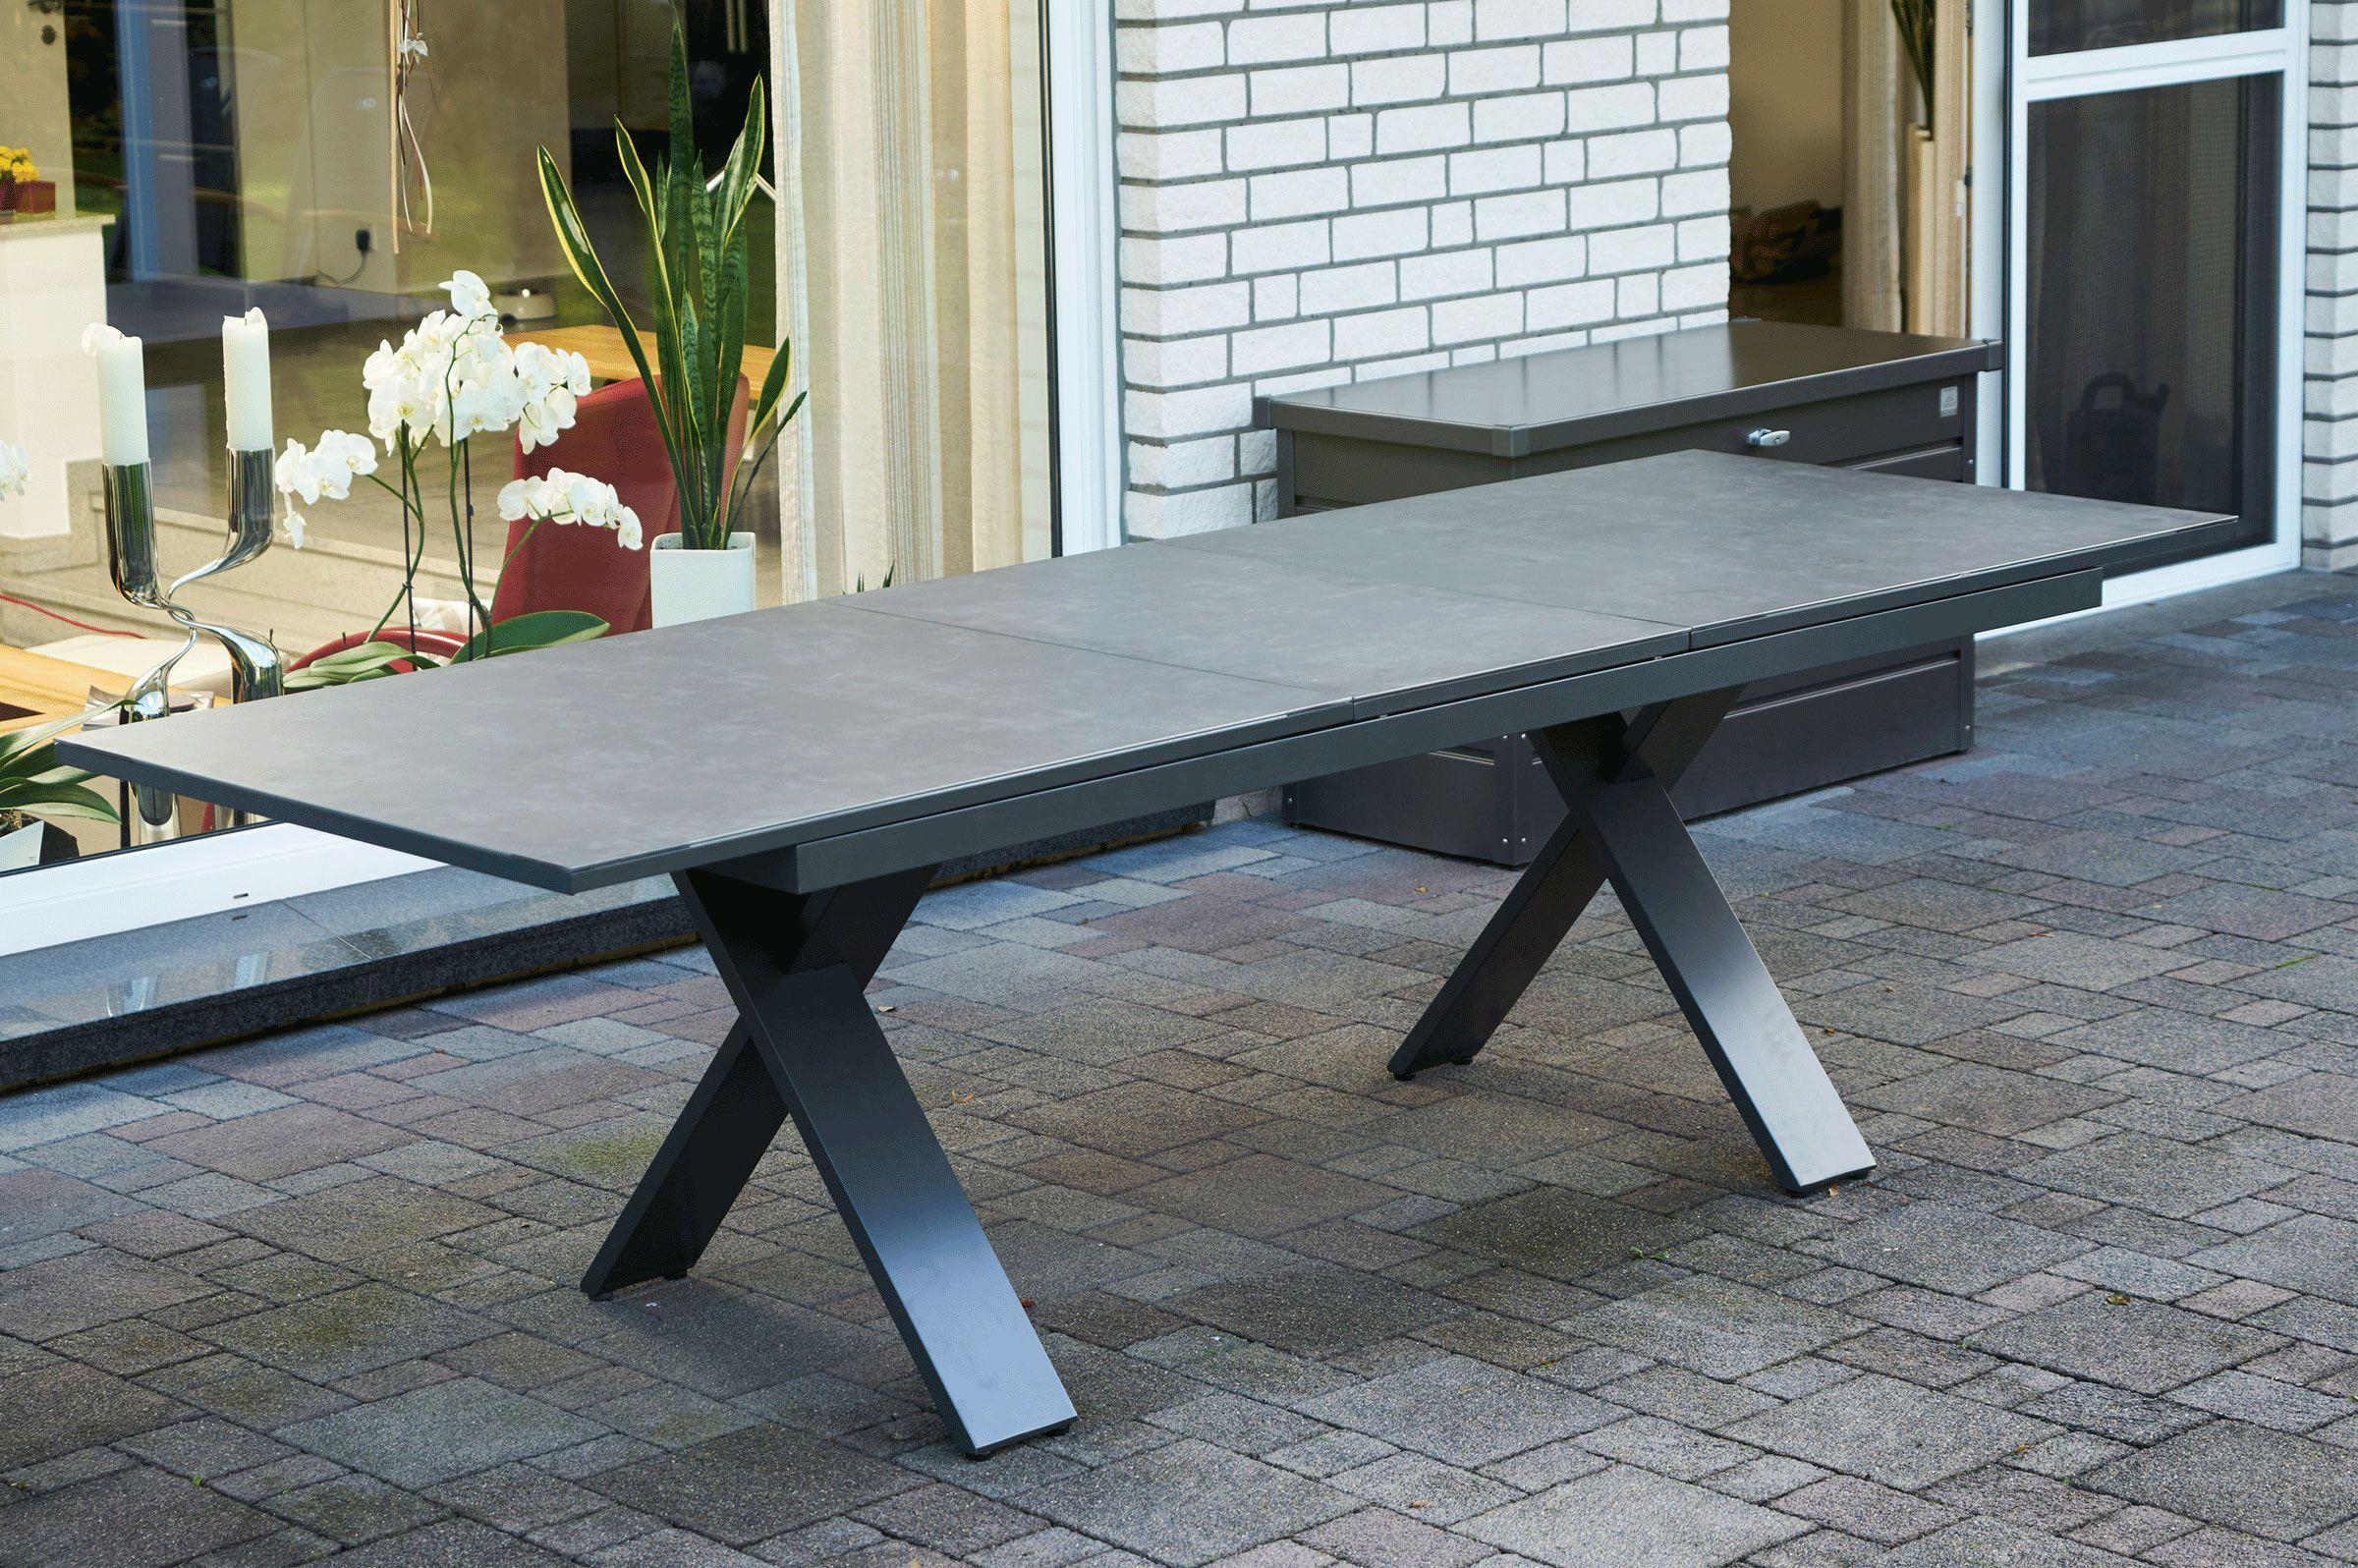 Hartman Sondermodell Xanadu / Da Vinci Sitzgruppe xerix/anthrazit Alu/Glaskeramik 2 Diningsessel 6 Multipos 220/280x100cm